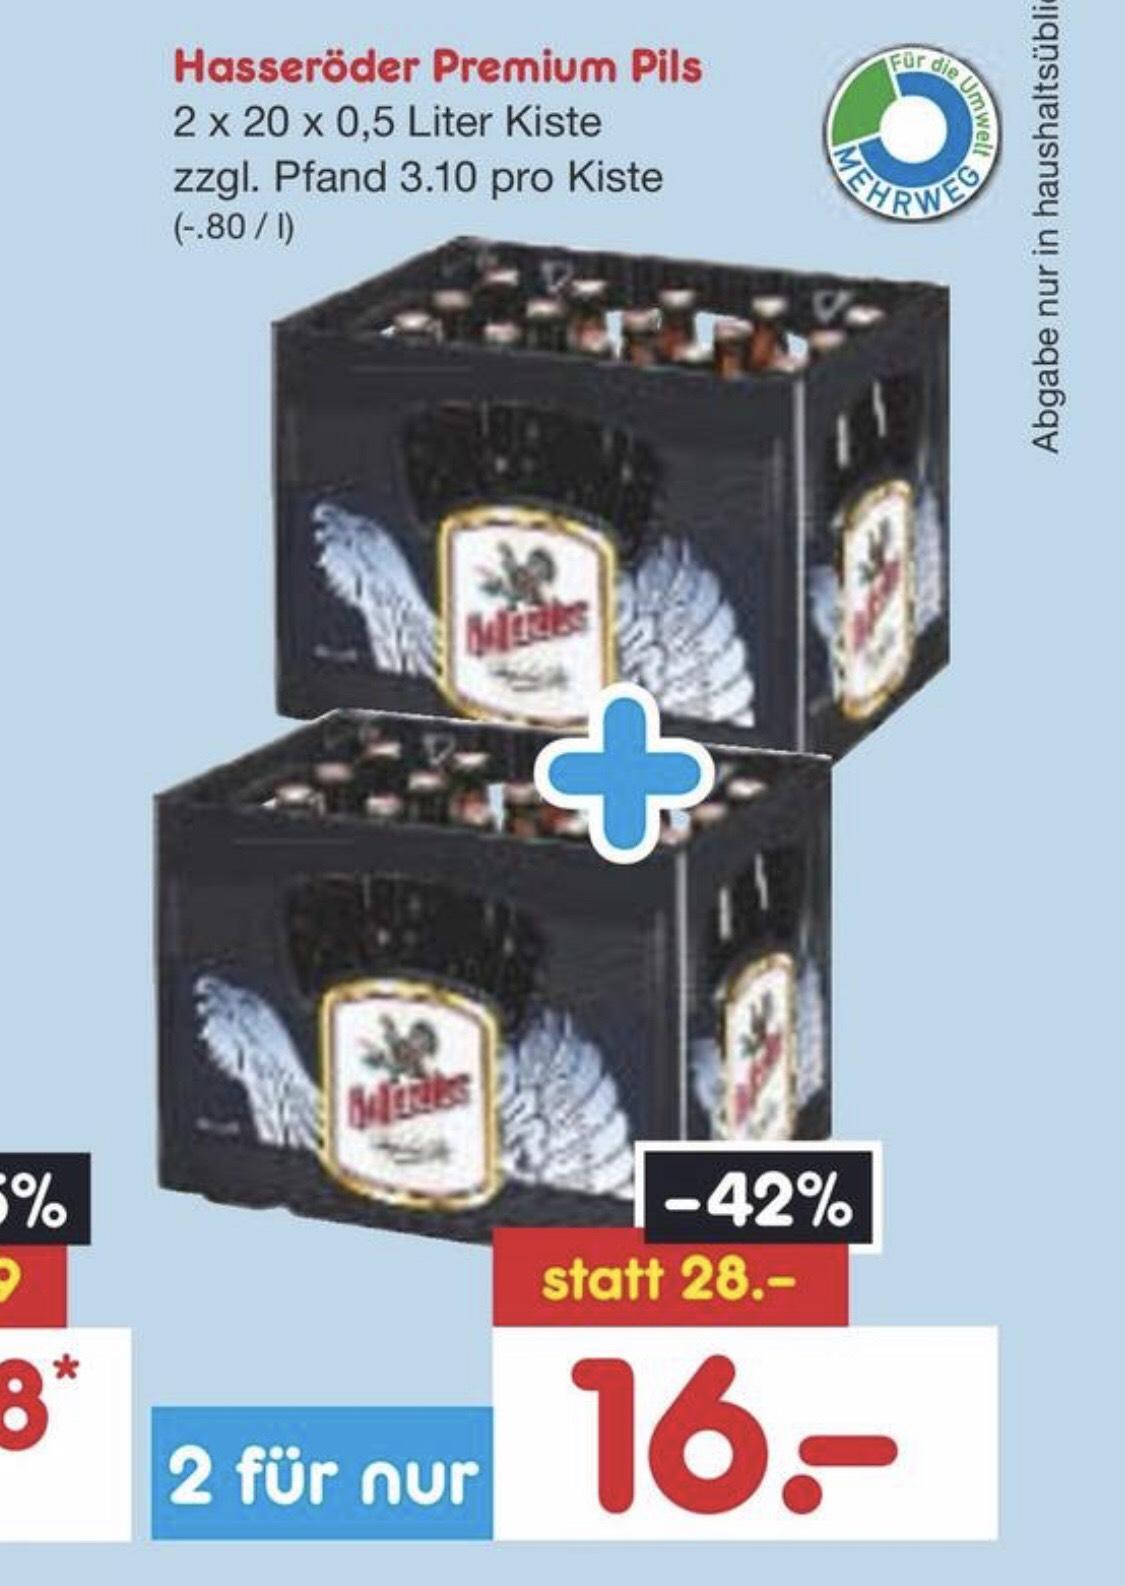 Hasseröder Premium Pils (2 x 20 x 0,5l)